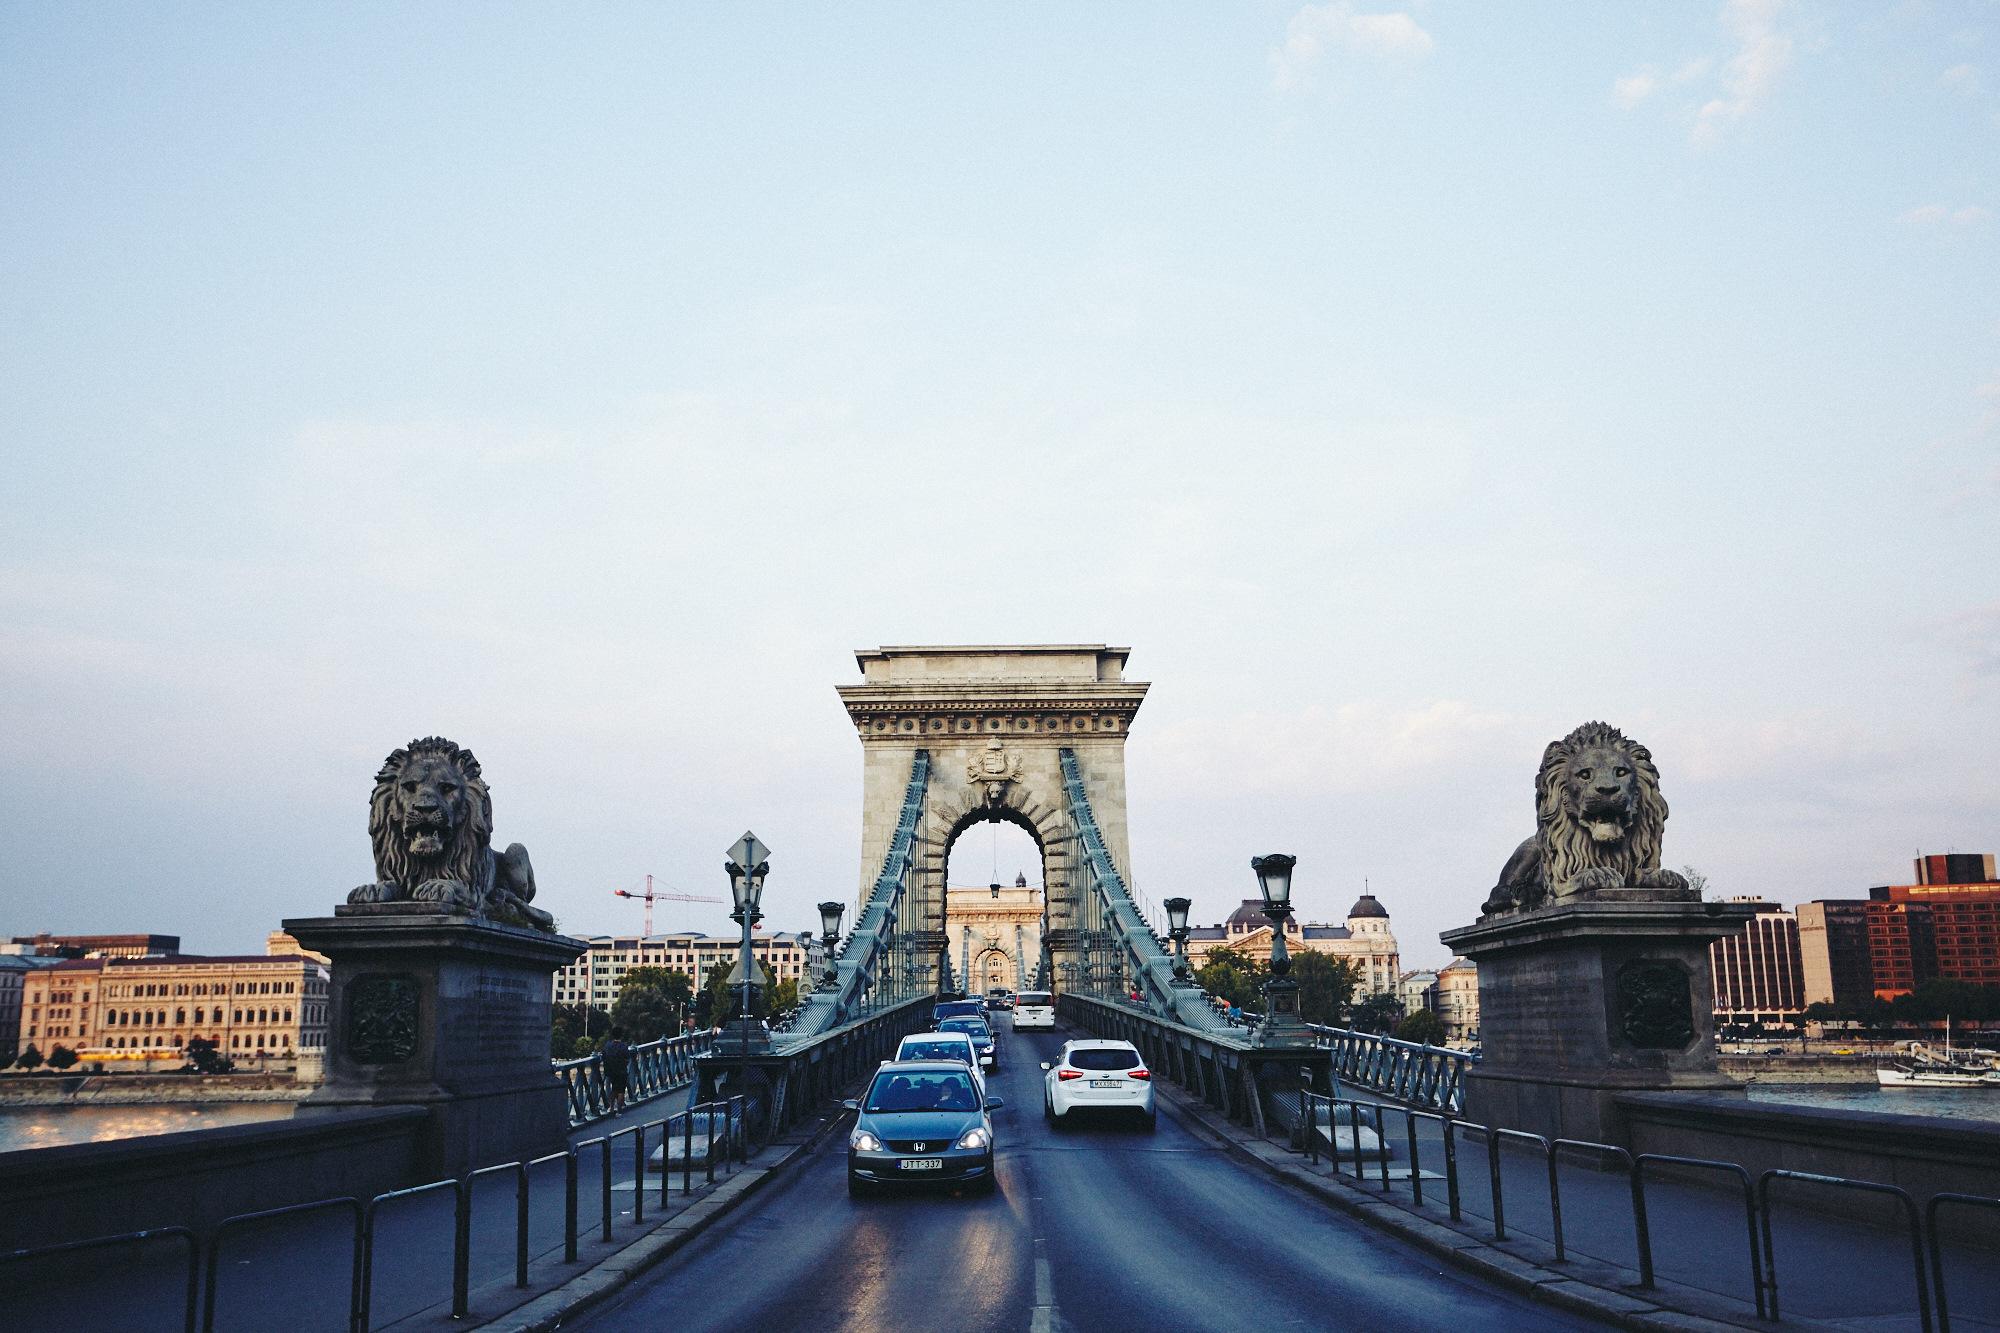 maxmotel_budapest_aug2015_day02_14_danube_bridge_1417